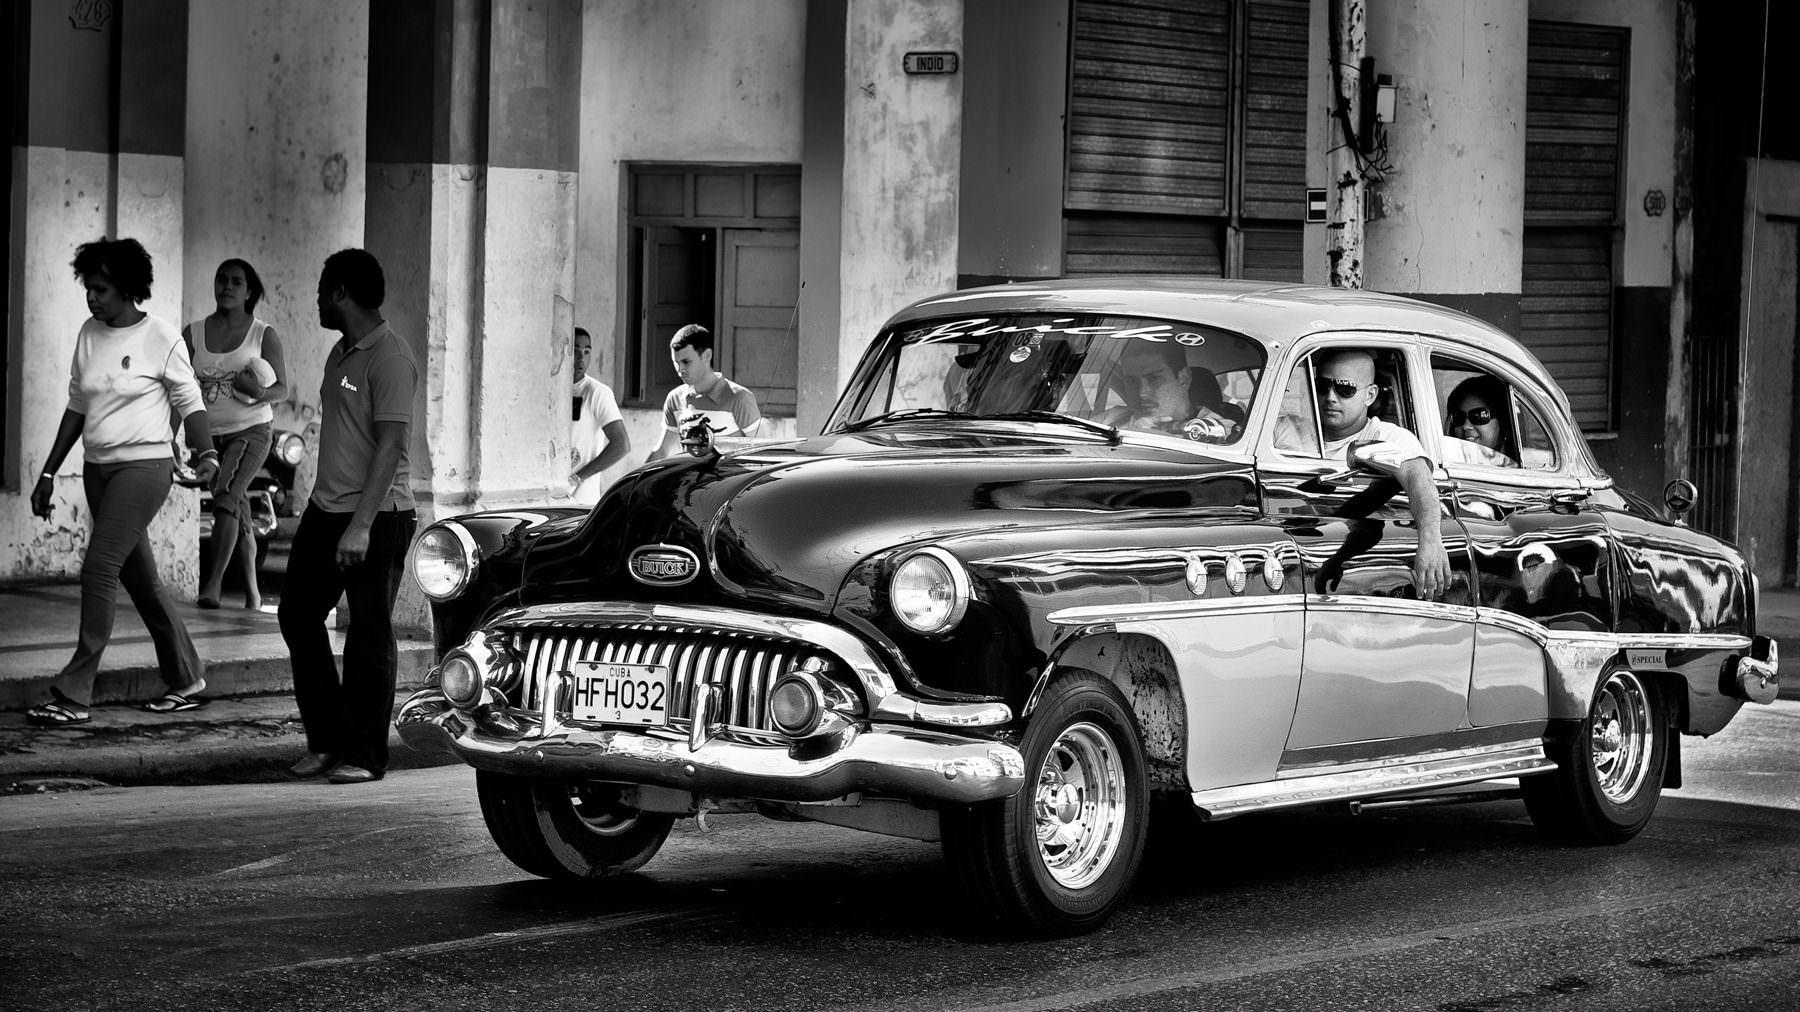 Cuba Havana Monte Street - a taxi drives up the monte street © by Gerry Pacher